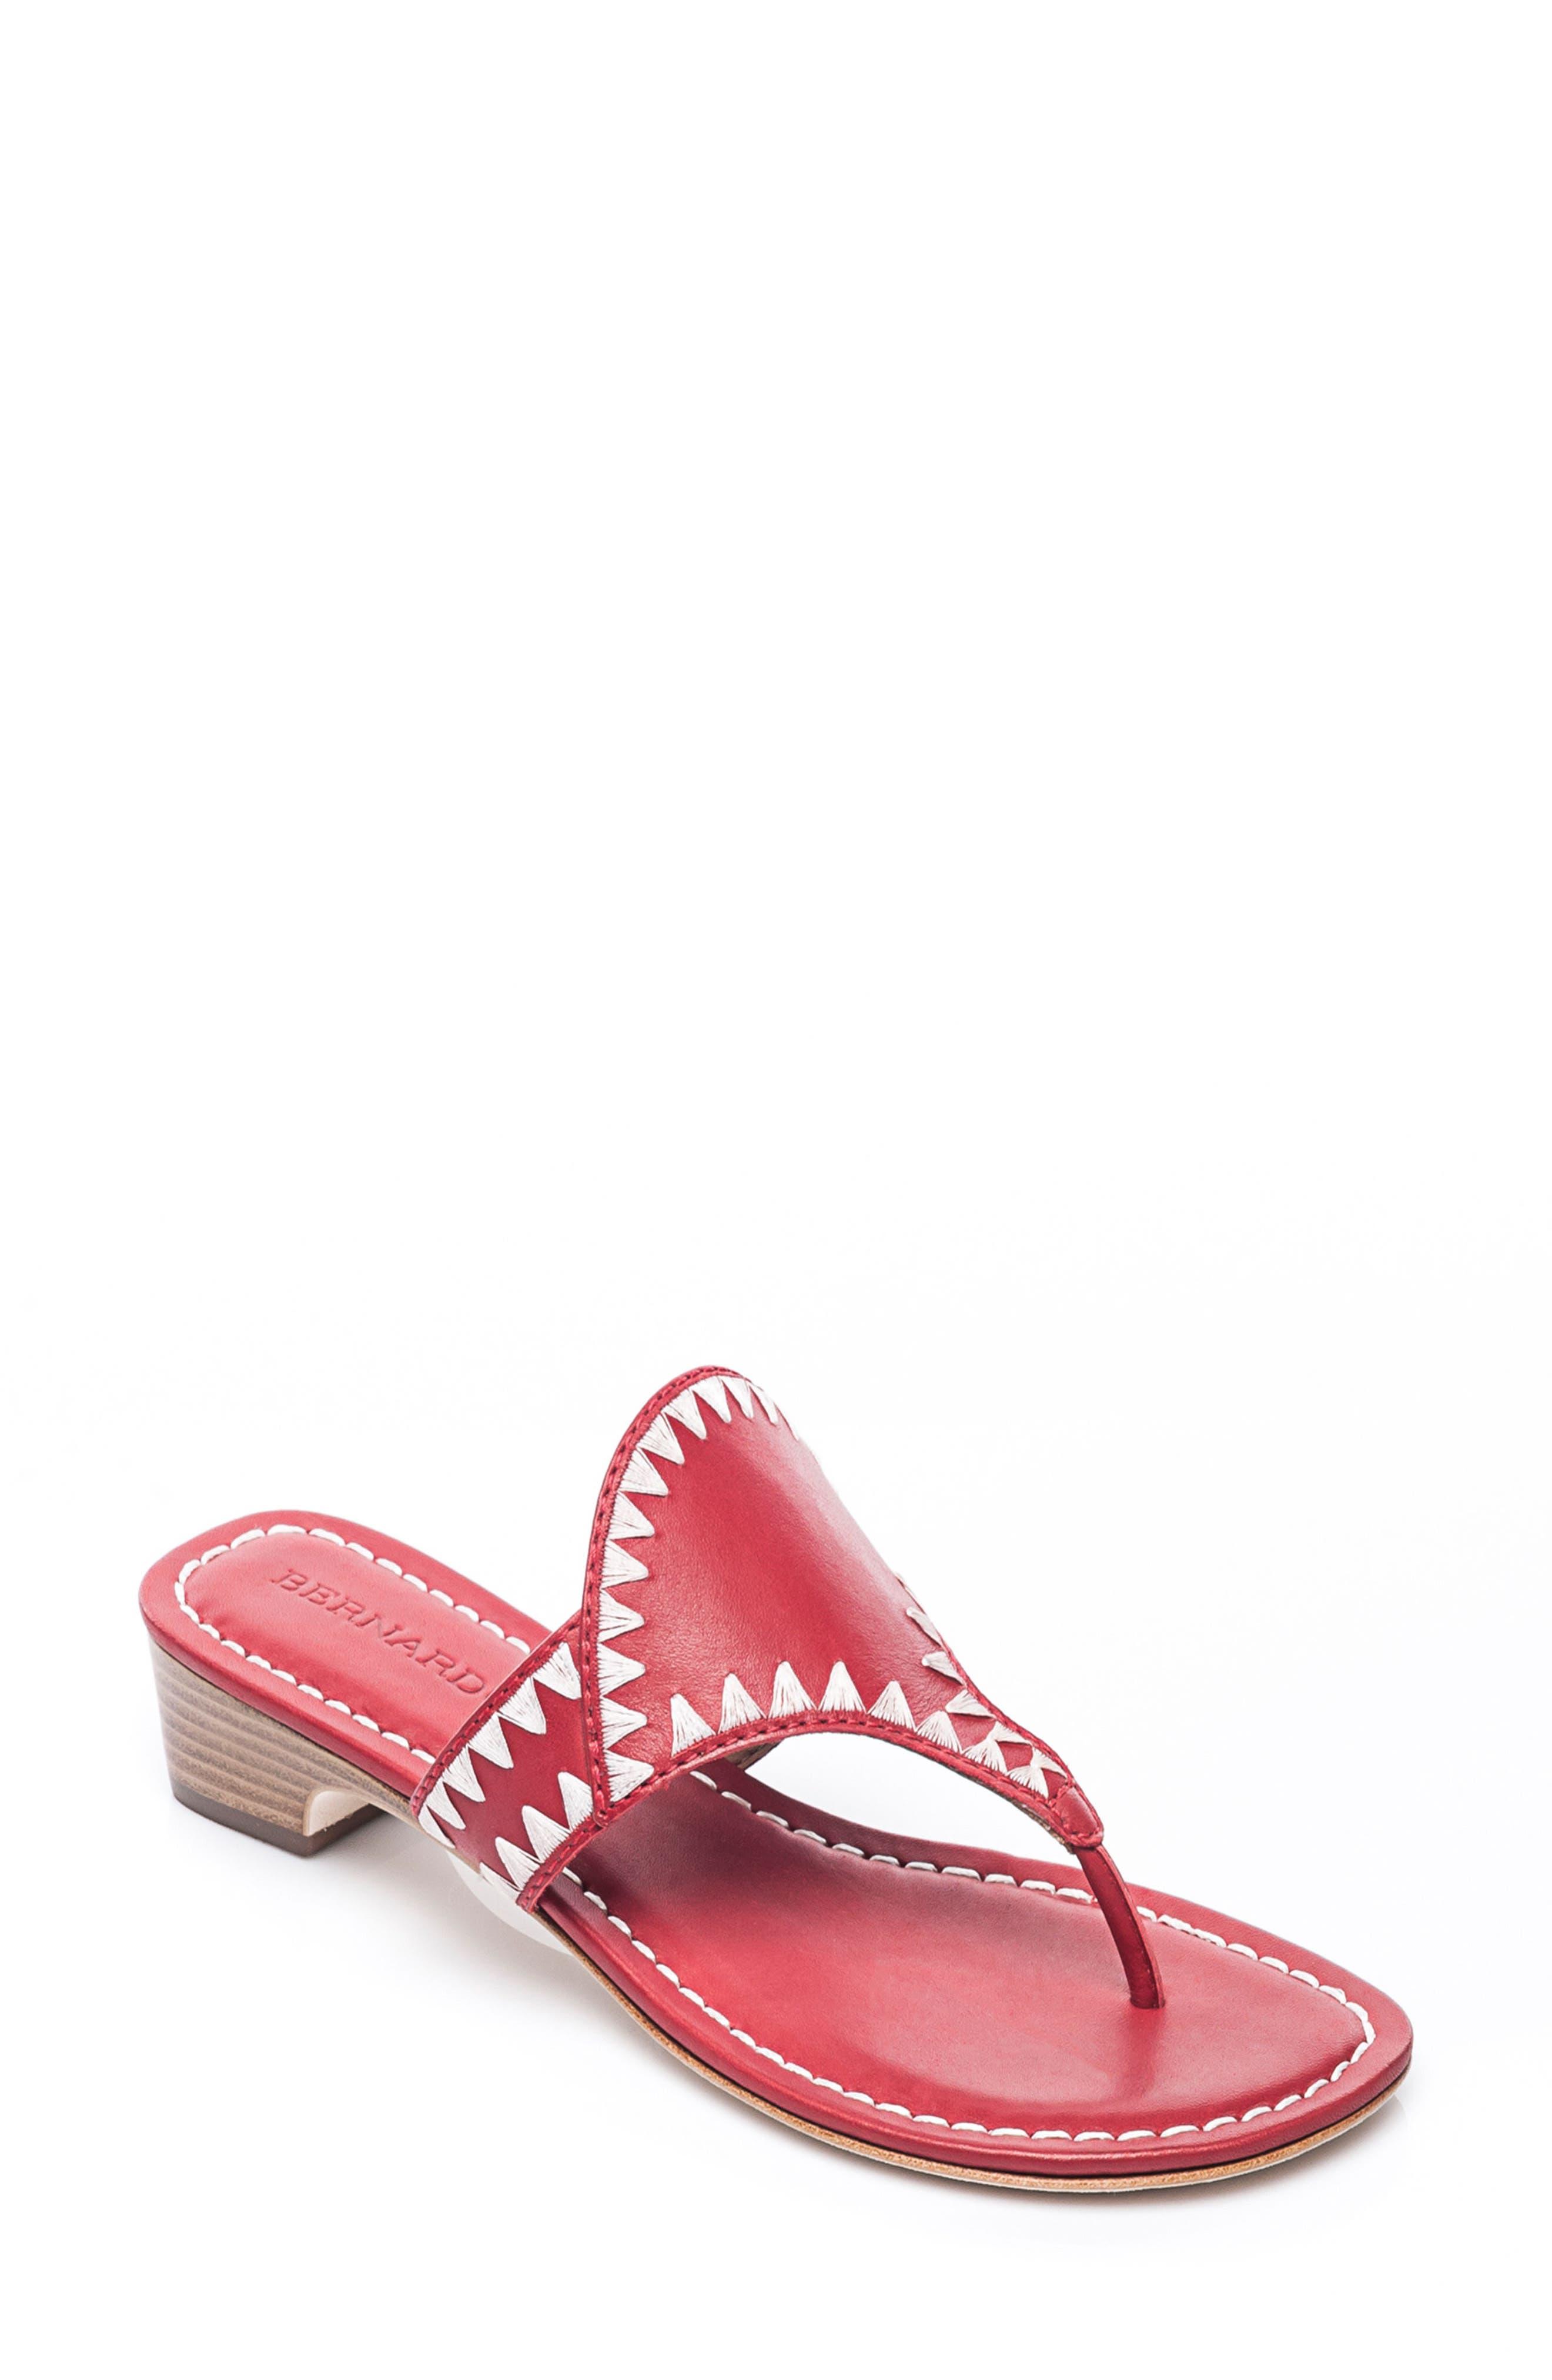 Bernardo Gabi Embroidered Sandal,                             Main thumbnail 1, color,                             RED LEATHER